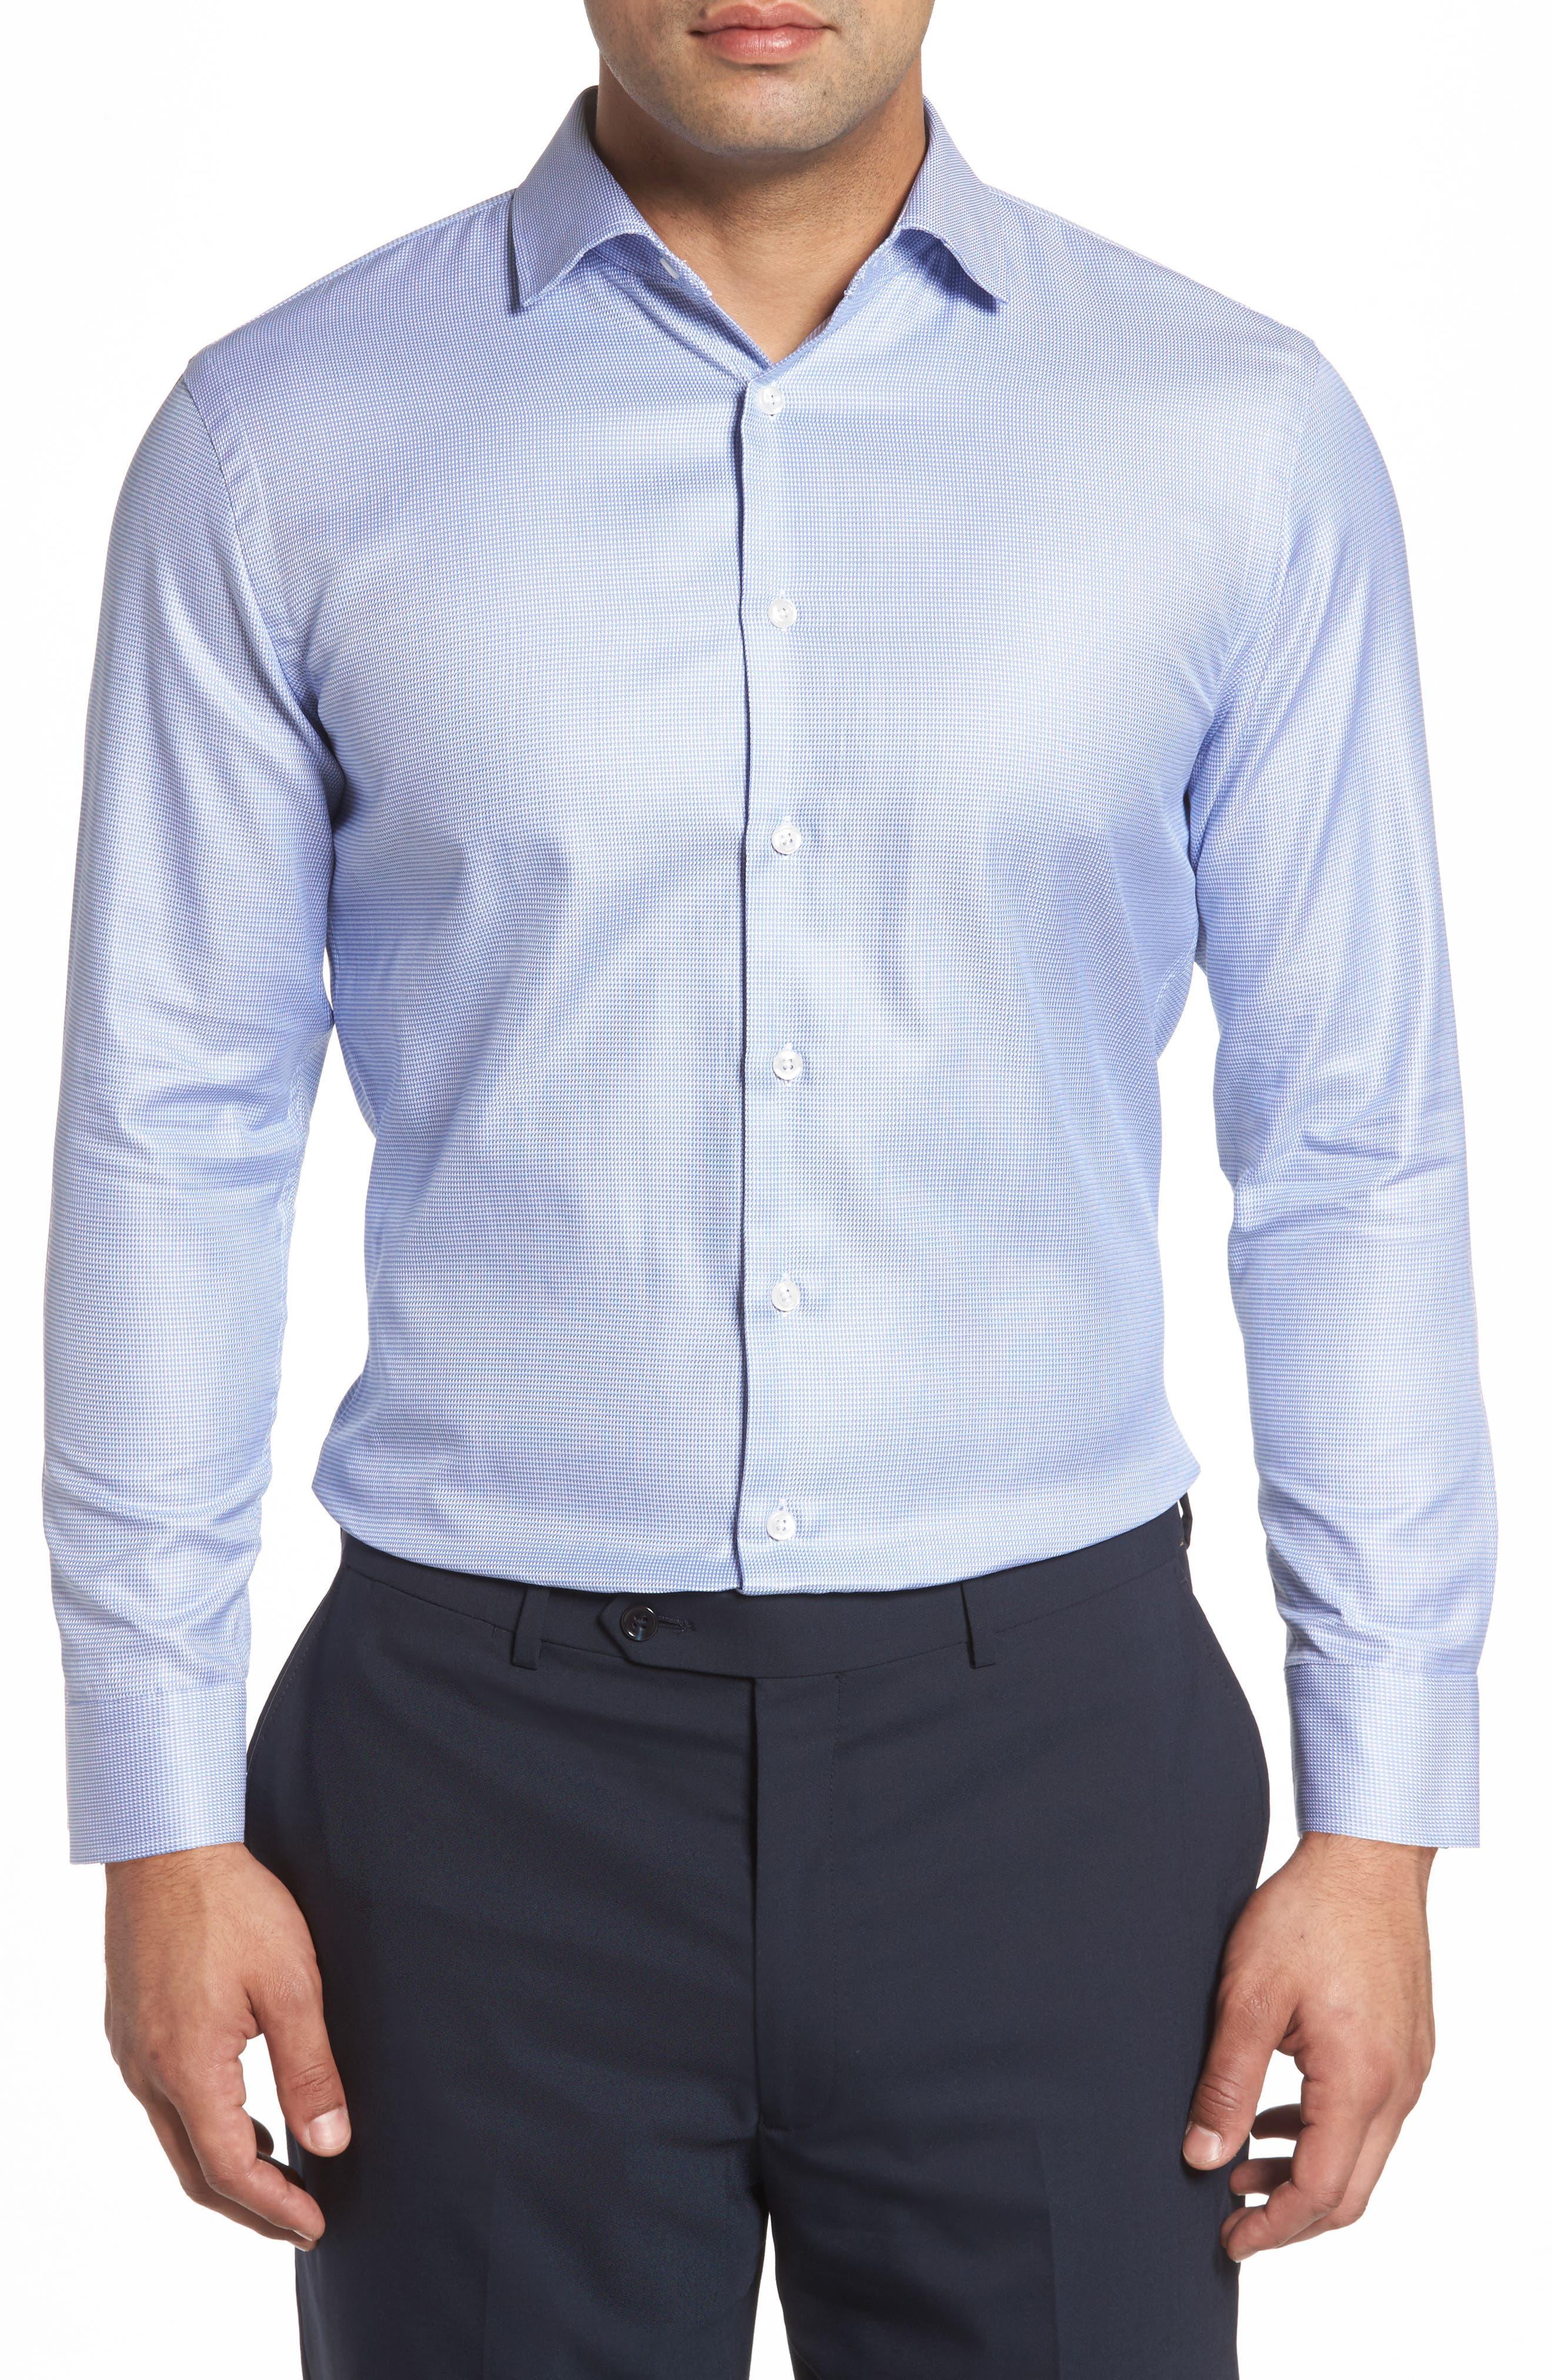 Alternate Image 2  - John W. Nordstrom® Trim Fit Solid Dress Shirt